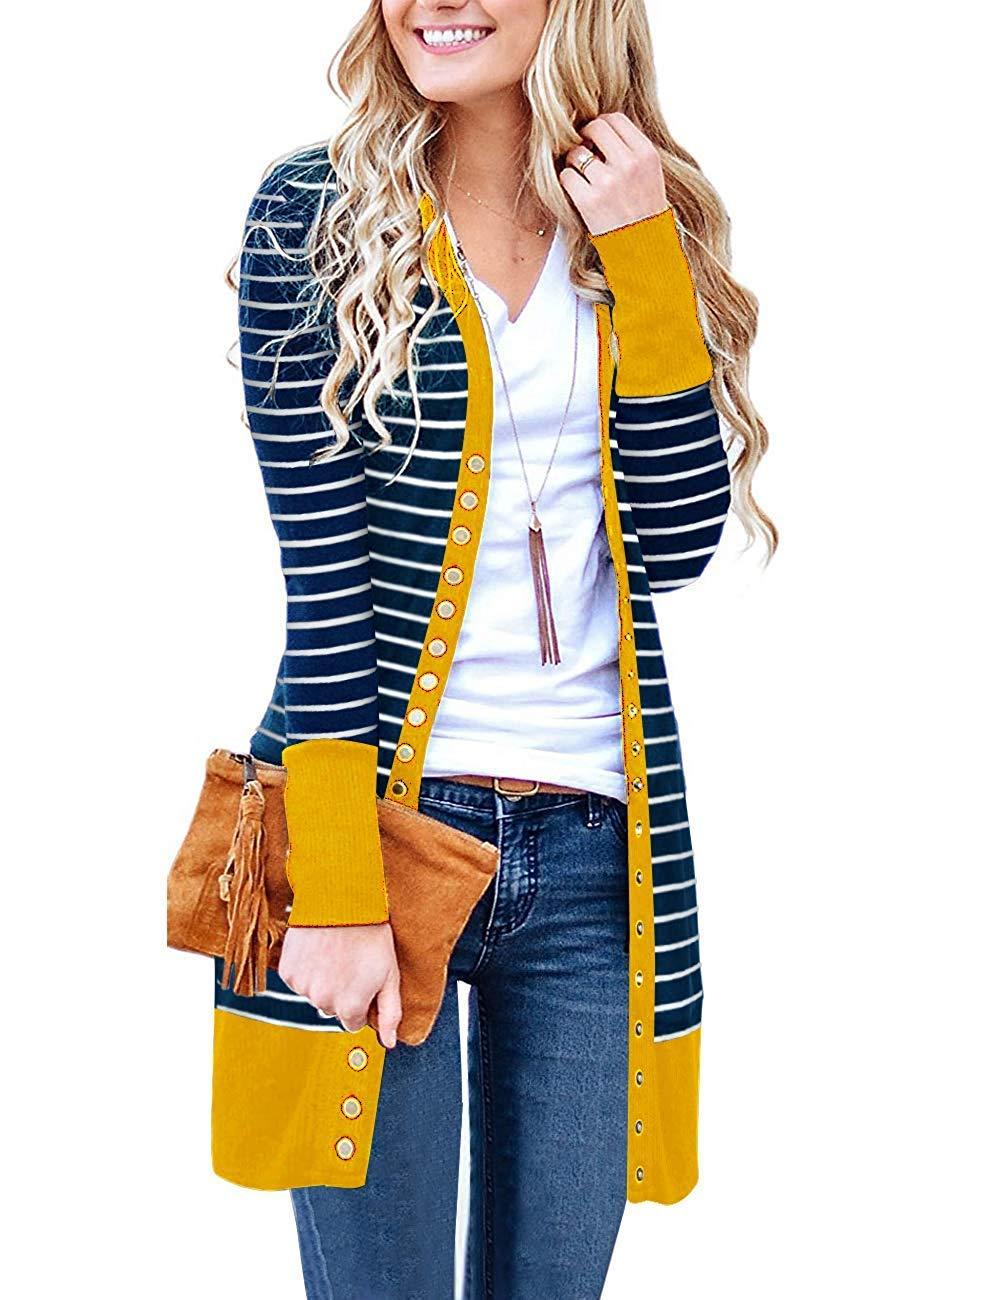 Basic Faith Women's S-3XL V-Neck Button Down Knitwear Long Sleeve Soft Knit Casual Cardigan Sweater Stripe Mustard S by Basic Faith